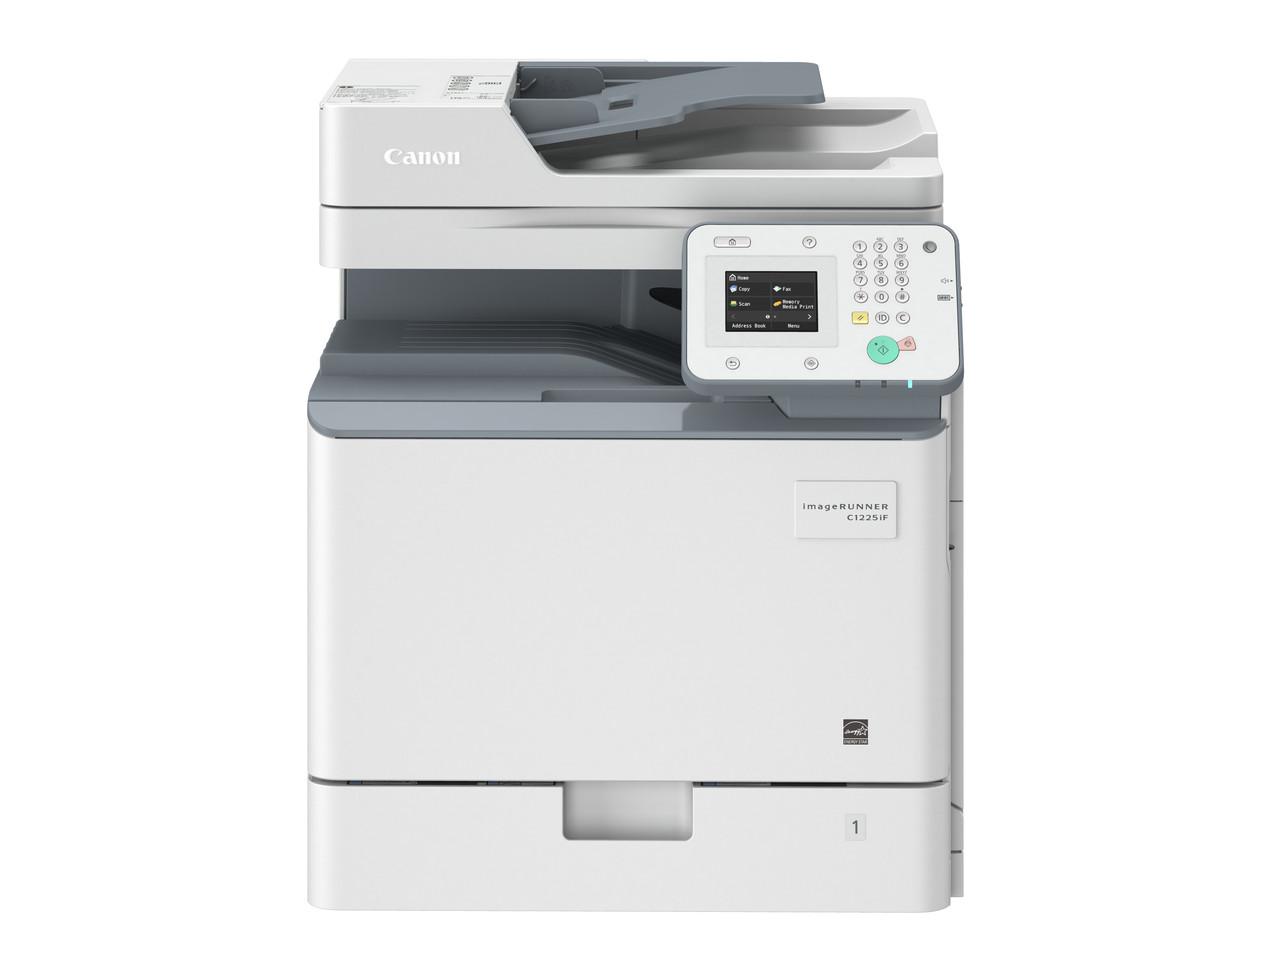 Canon imageRUNNER C1225 (принтер/копир/сканер)